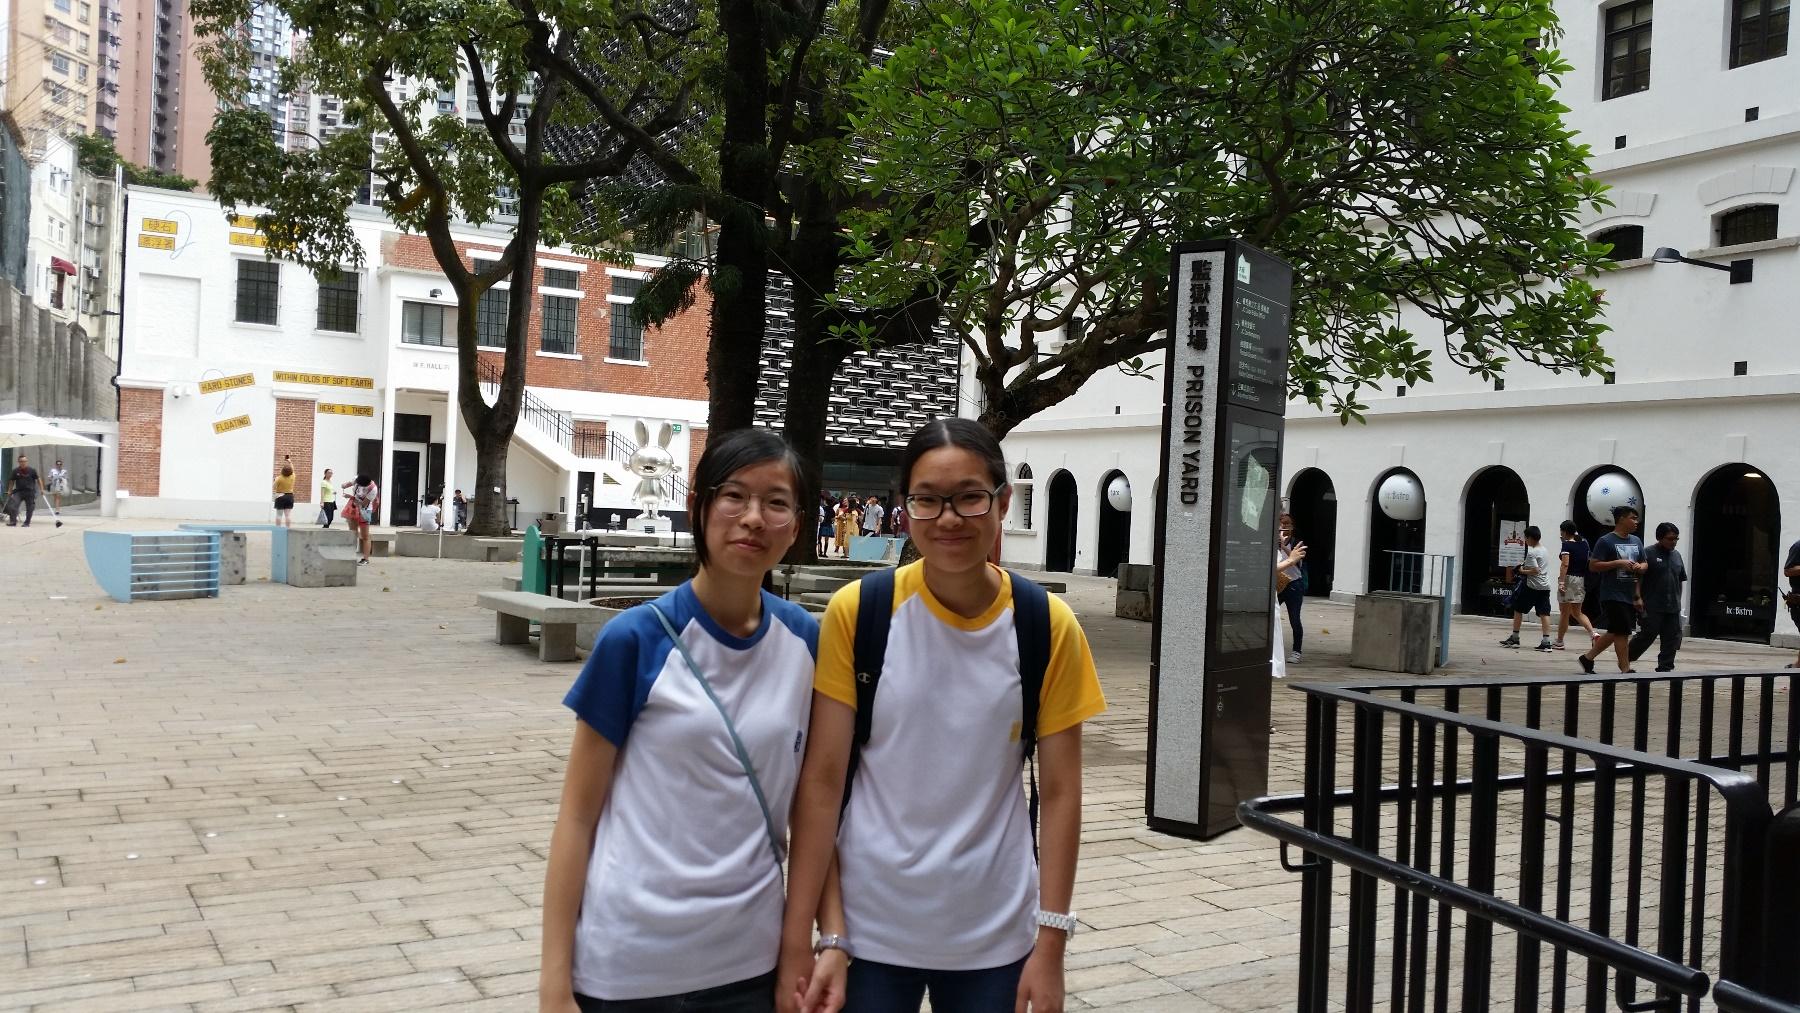 https://npc.edu.hk/sites/default/files/20190711_103935.jpg